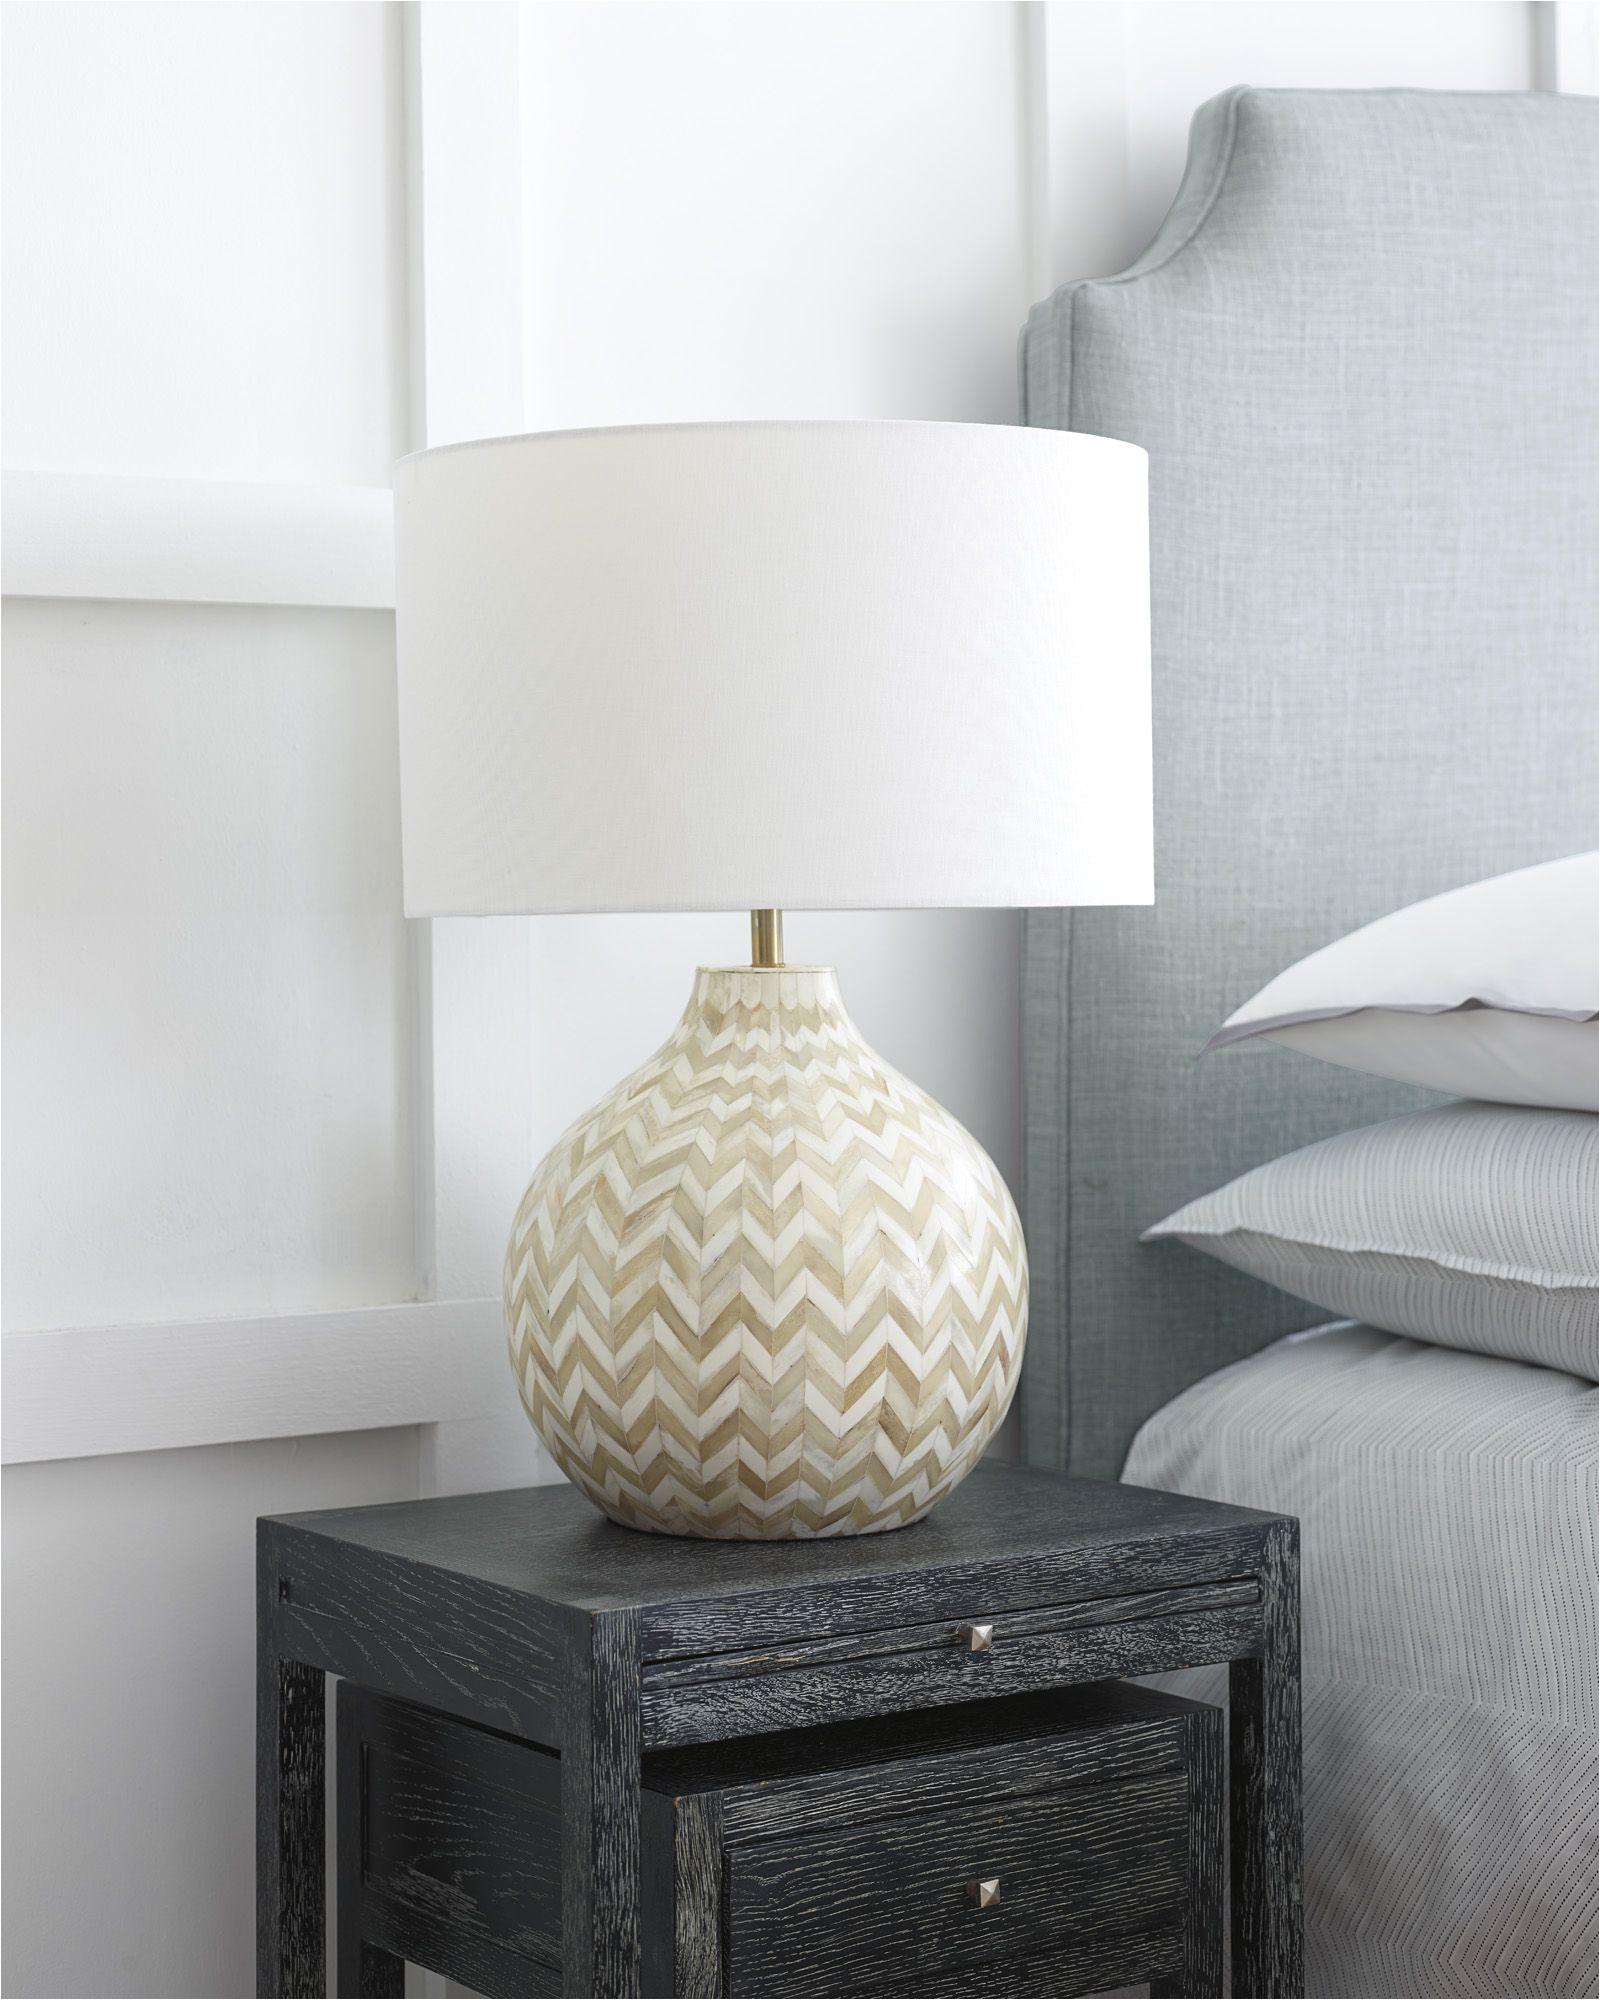 bone lamp nightstand bedroom inspiration via serena lily